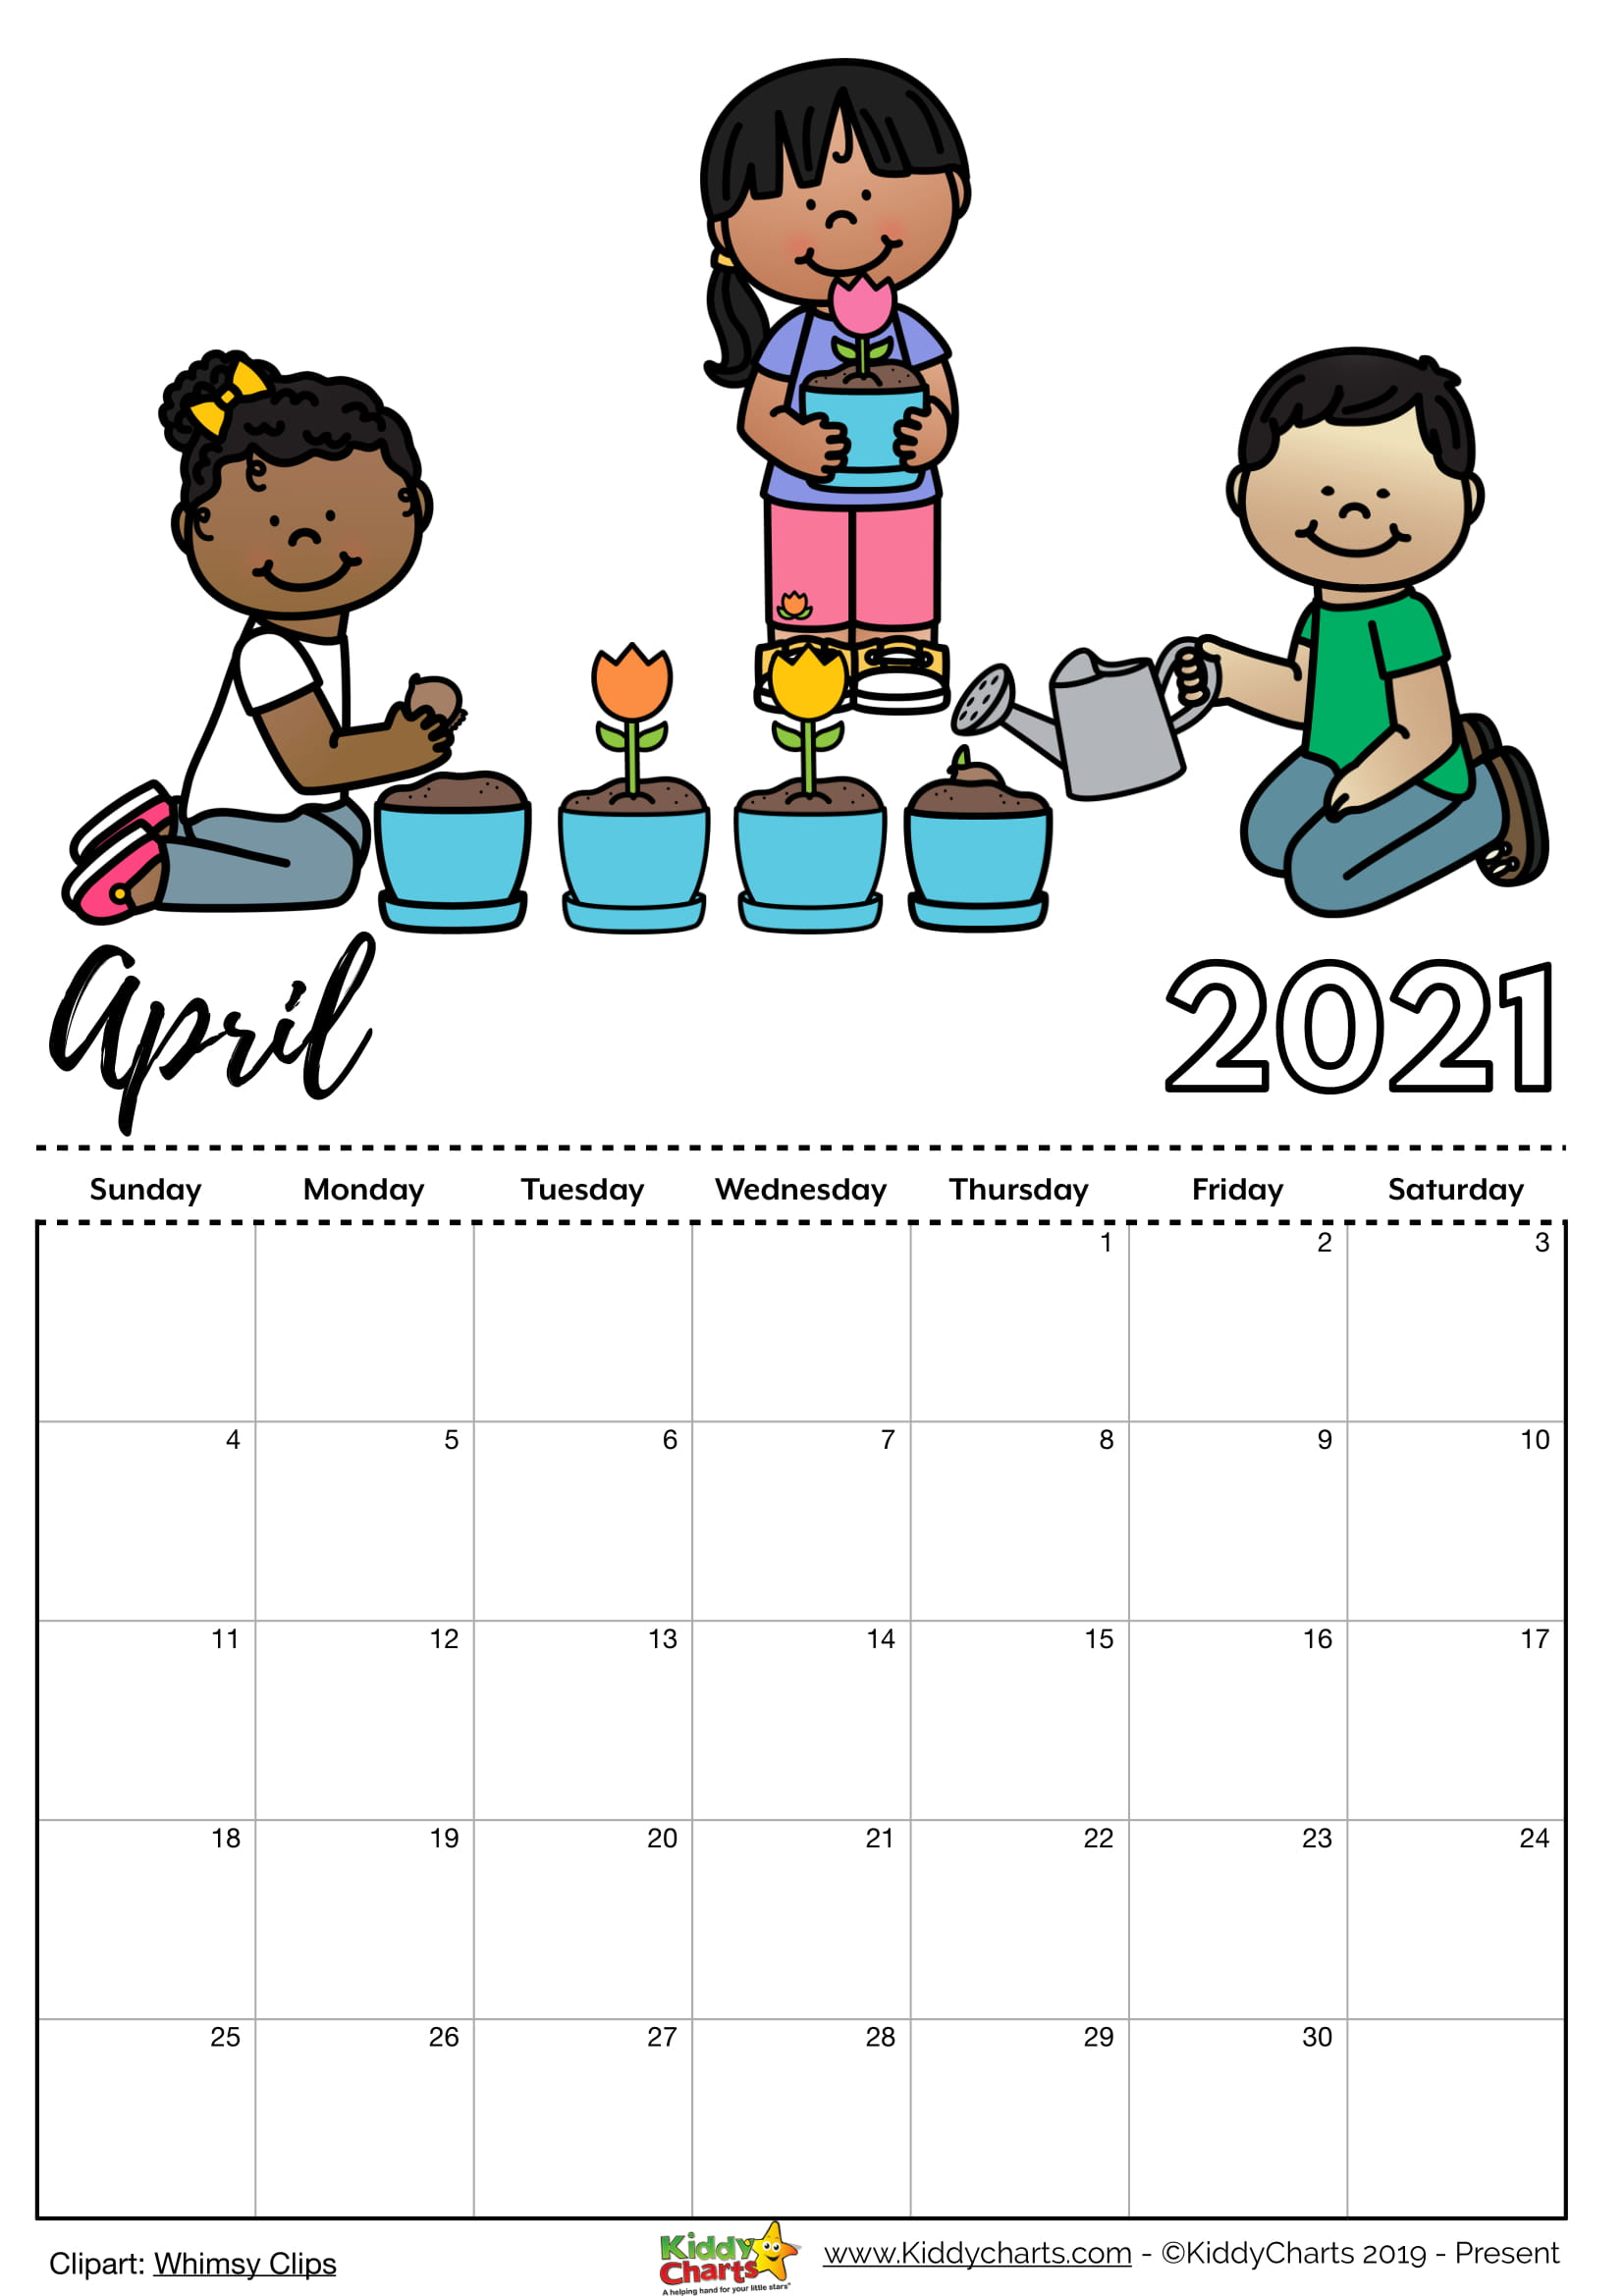 Free printable 2021 calendar: includes editable version